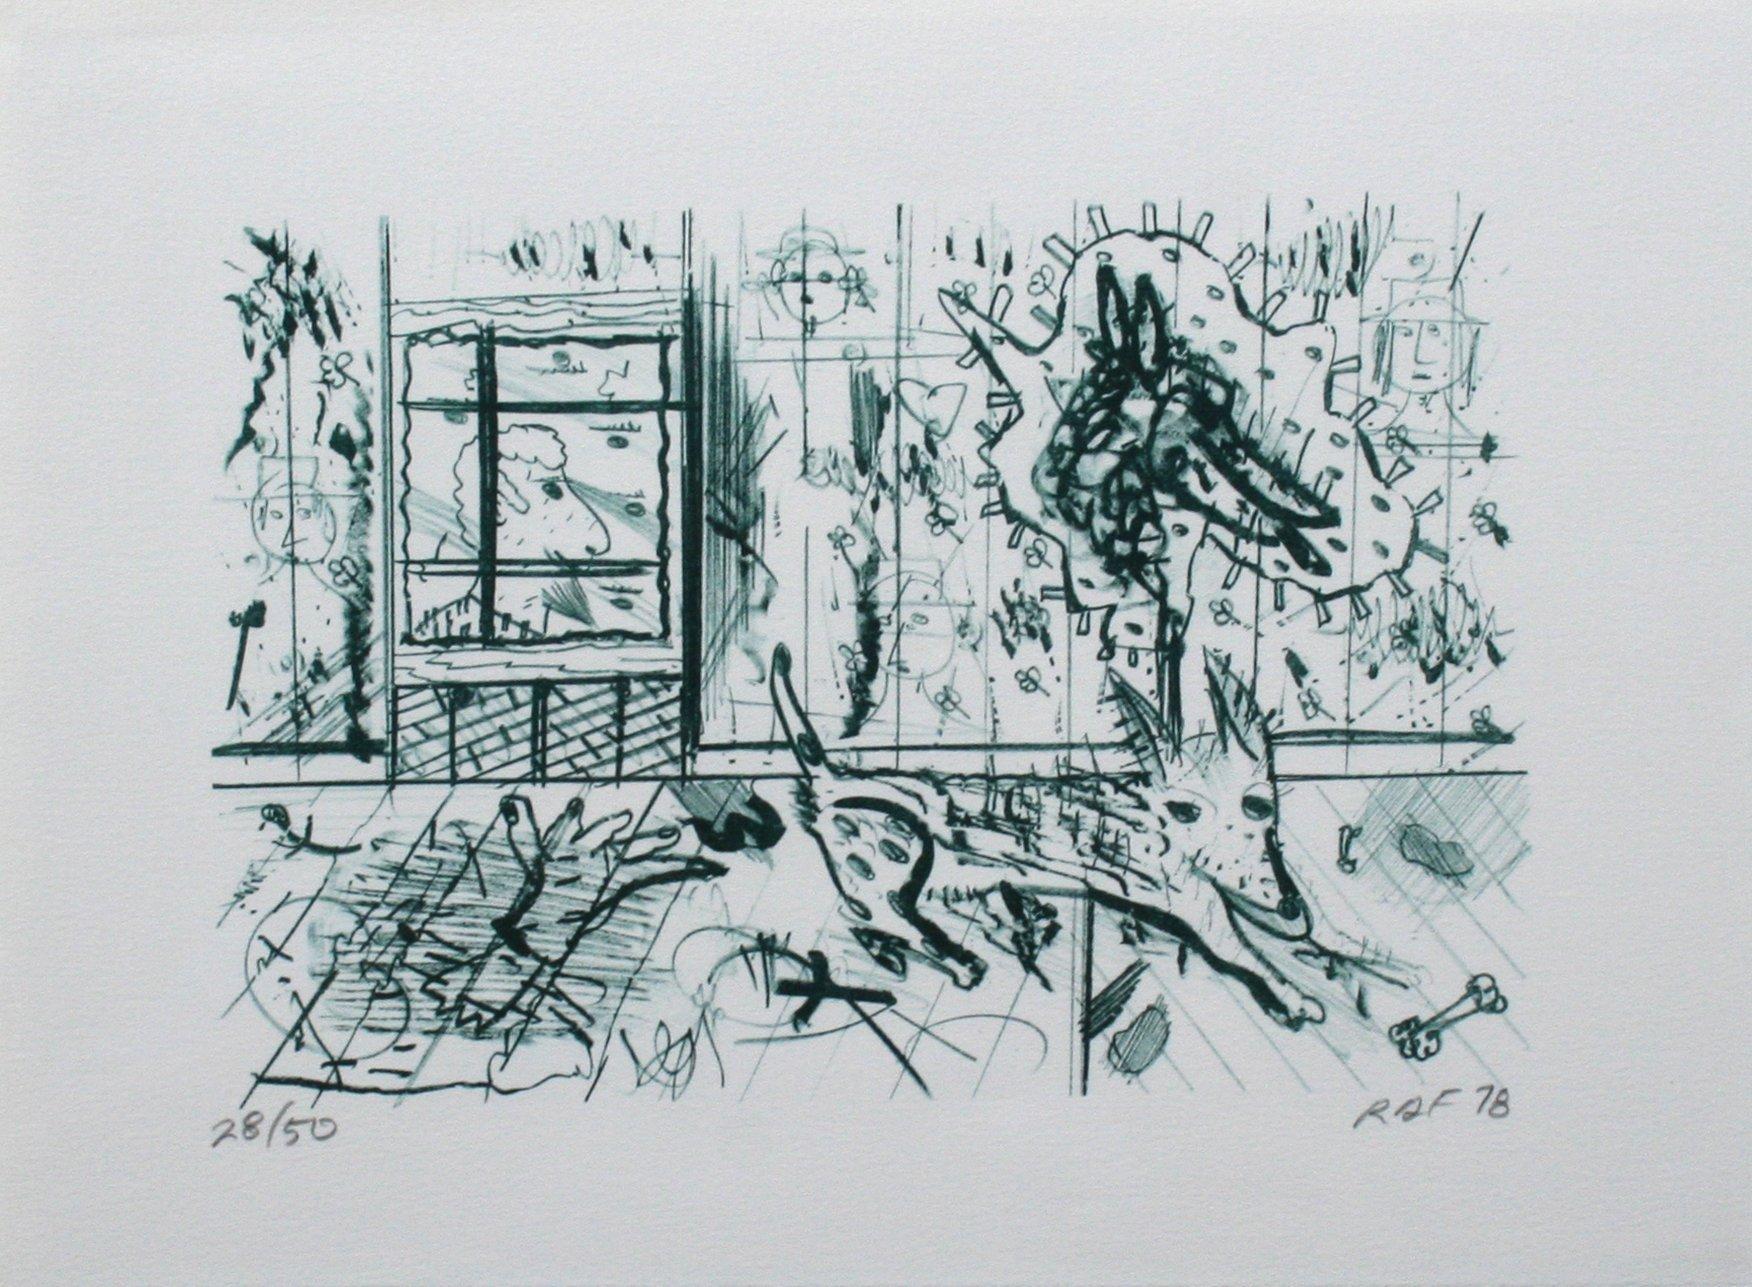 DeForest, Roy – Untitled 28/50